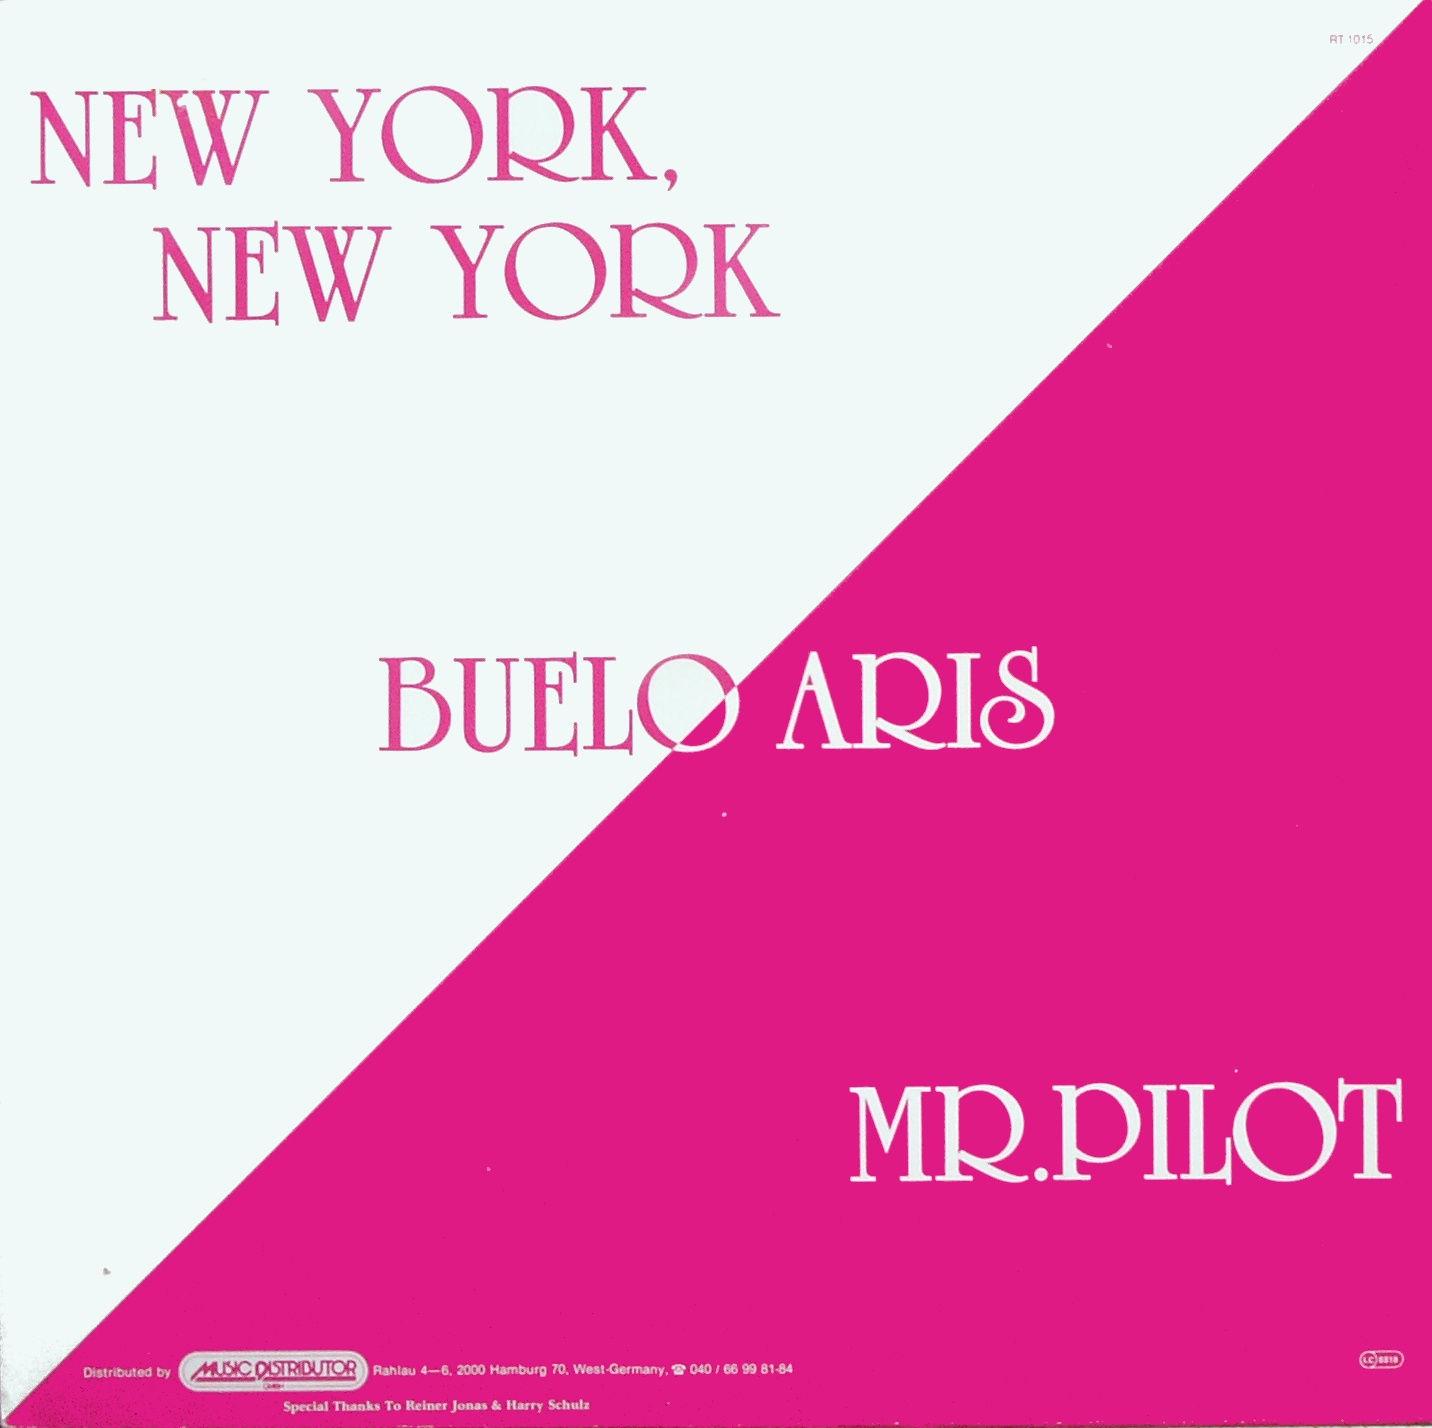 BUELO ARIS - New York, New York / Mr. Pilot - 12 inch x 1